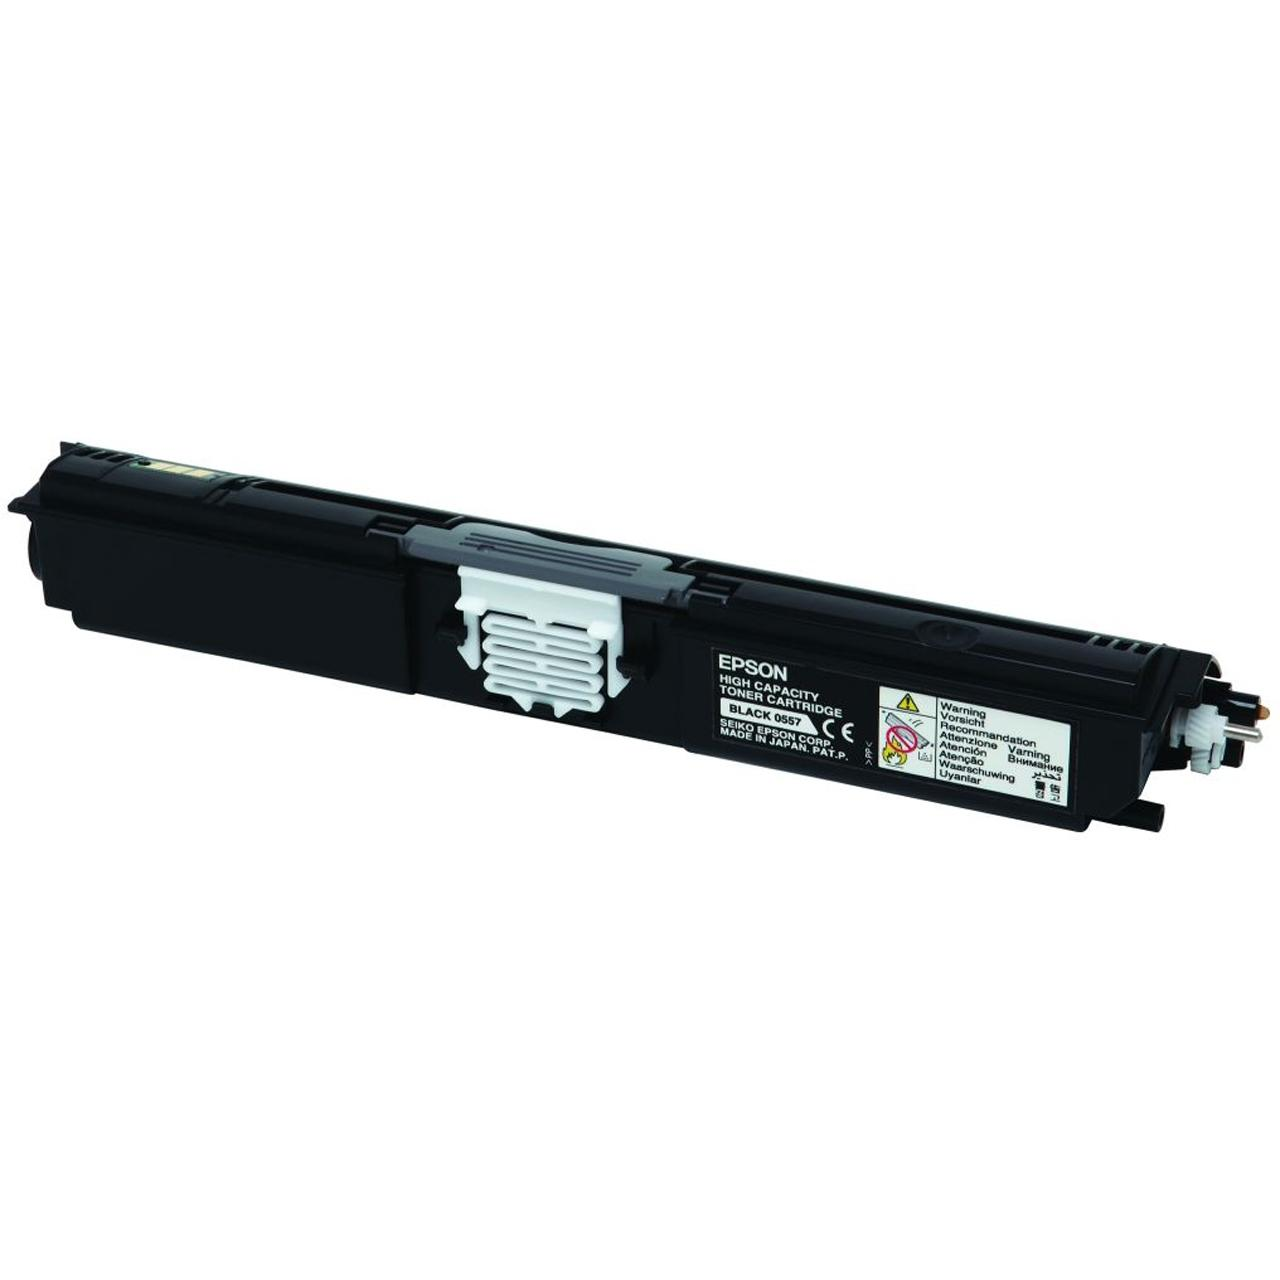 Epson S050557 Laser Toner Cartridge High Yield Page Life 2700pp Black Ref C13S050557